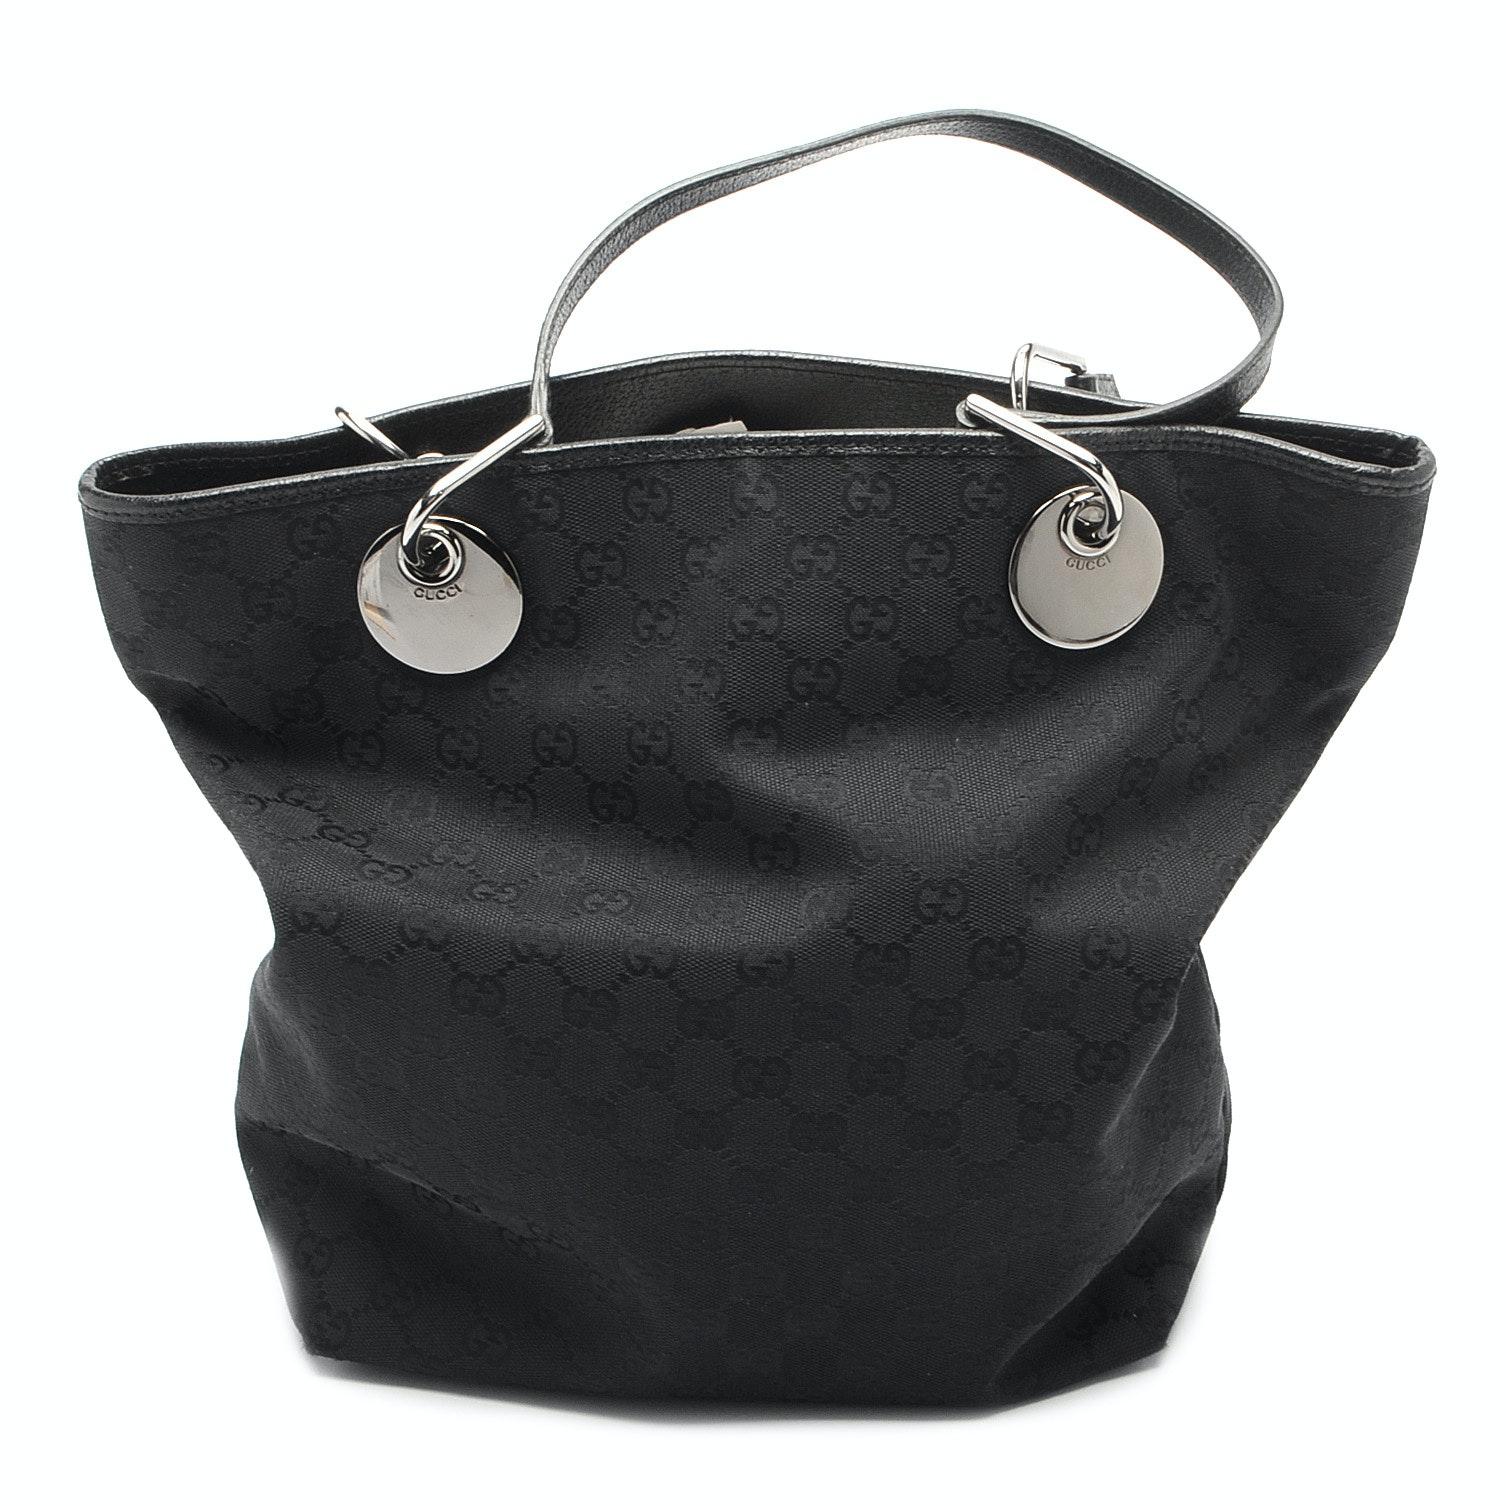 Gucci Black GG Canvas Tote Handbag